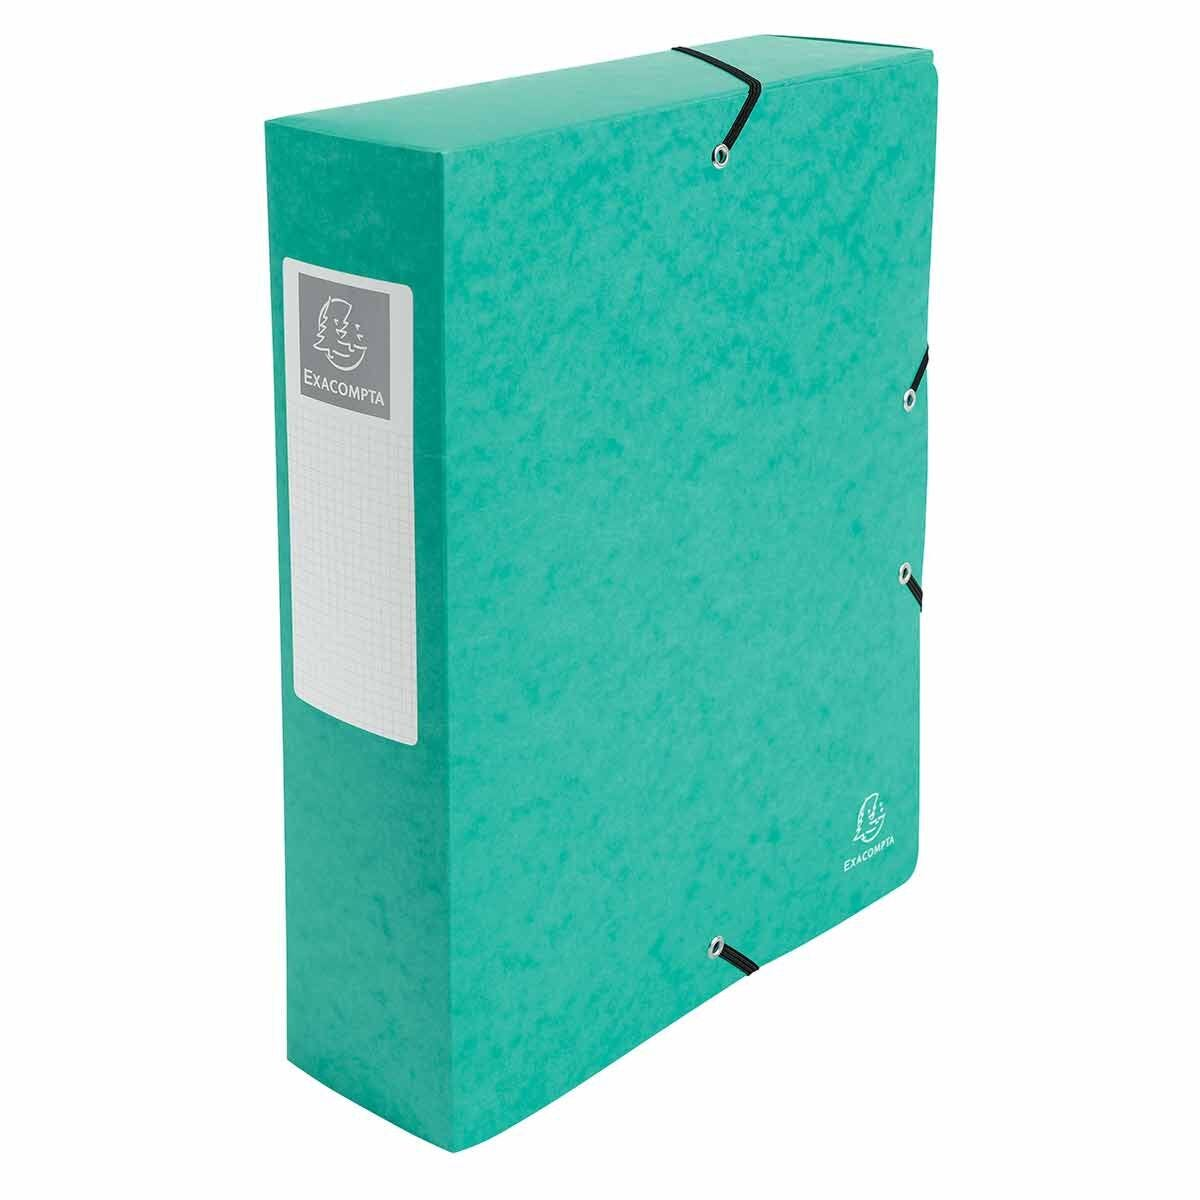 Exacompta Elasticated Box File Pressboard A4 80mm Pack of 6 Green